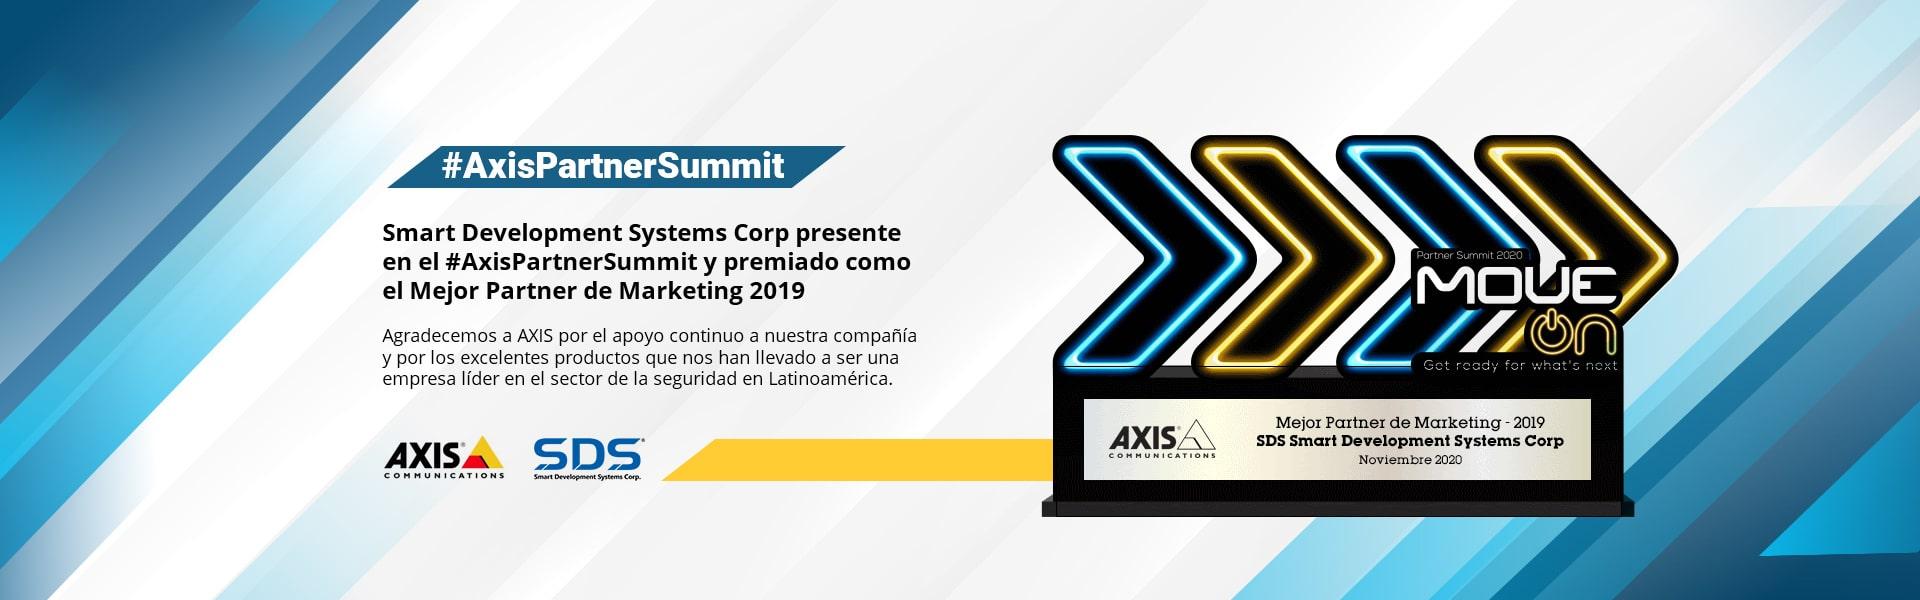 sds-axis-partner-summit-min